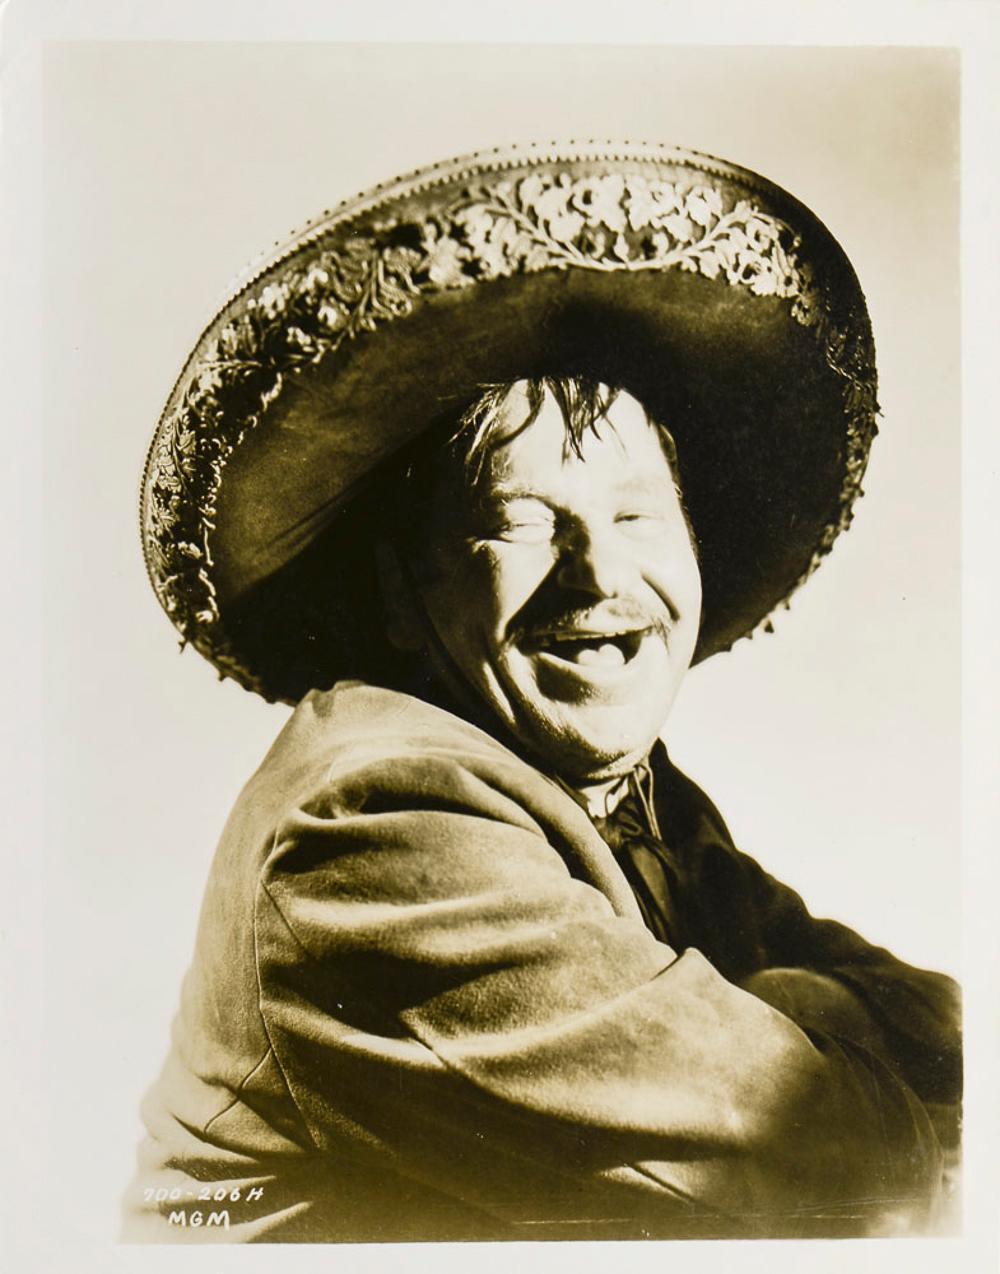 Wallace Beery portrait, photograph, 26 x 20 cm.